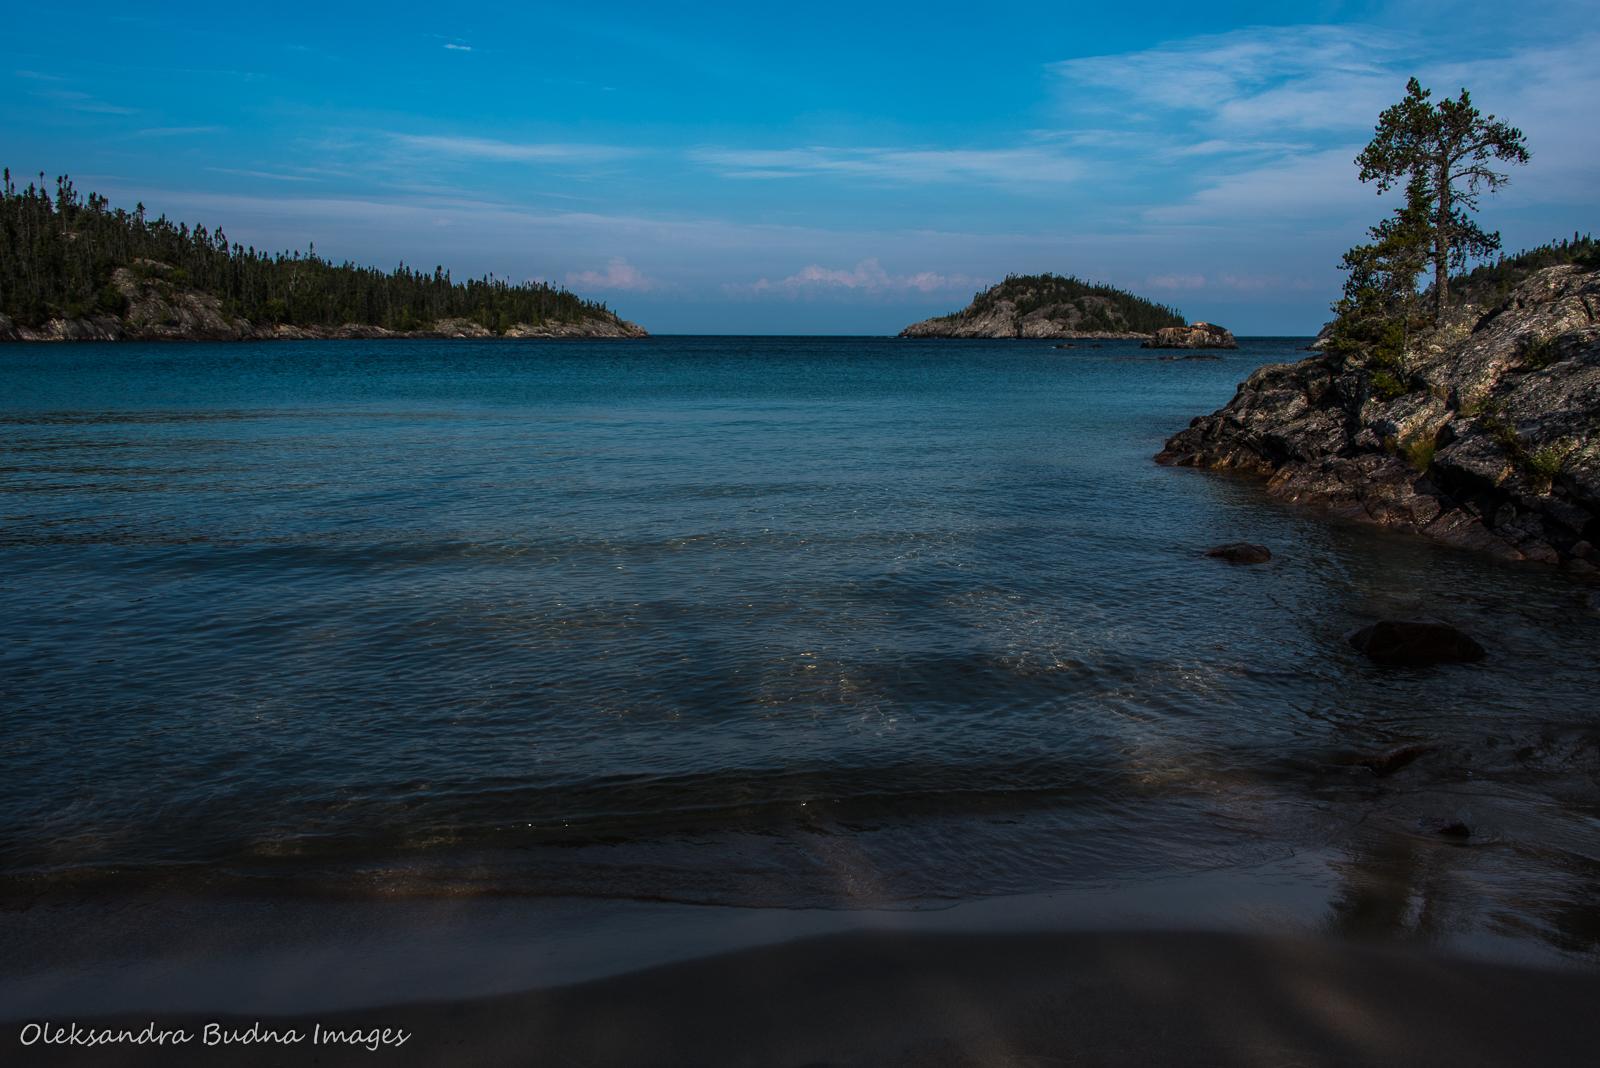 Morning on Lake Superior at Fisherman's Cove in Pukaskwa